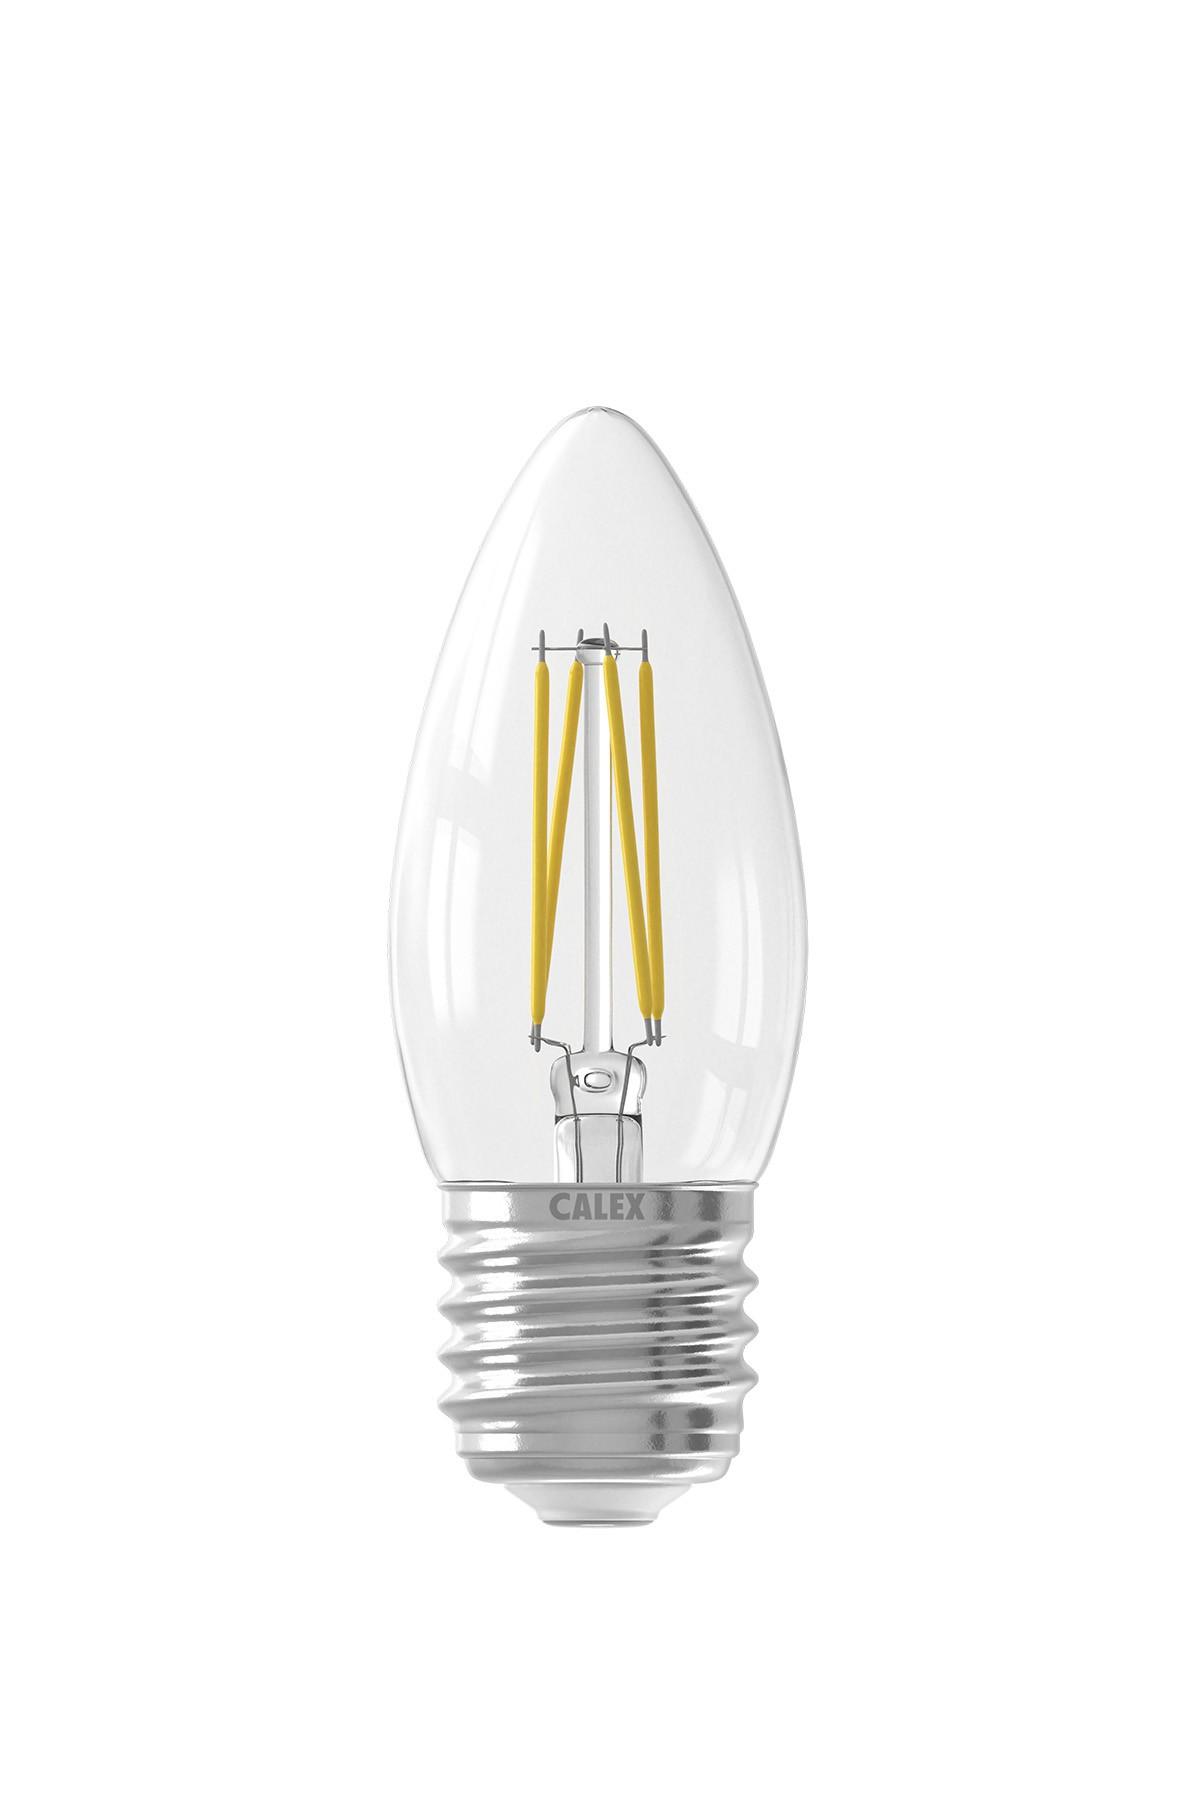 Filament LED Dimbare Kaarslamp 240V 3,5W E27